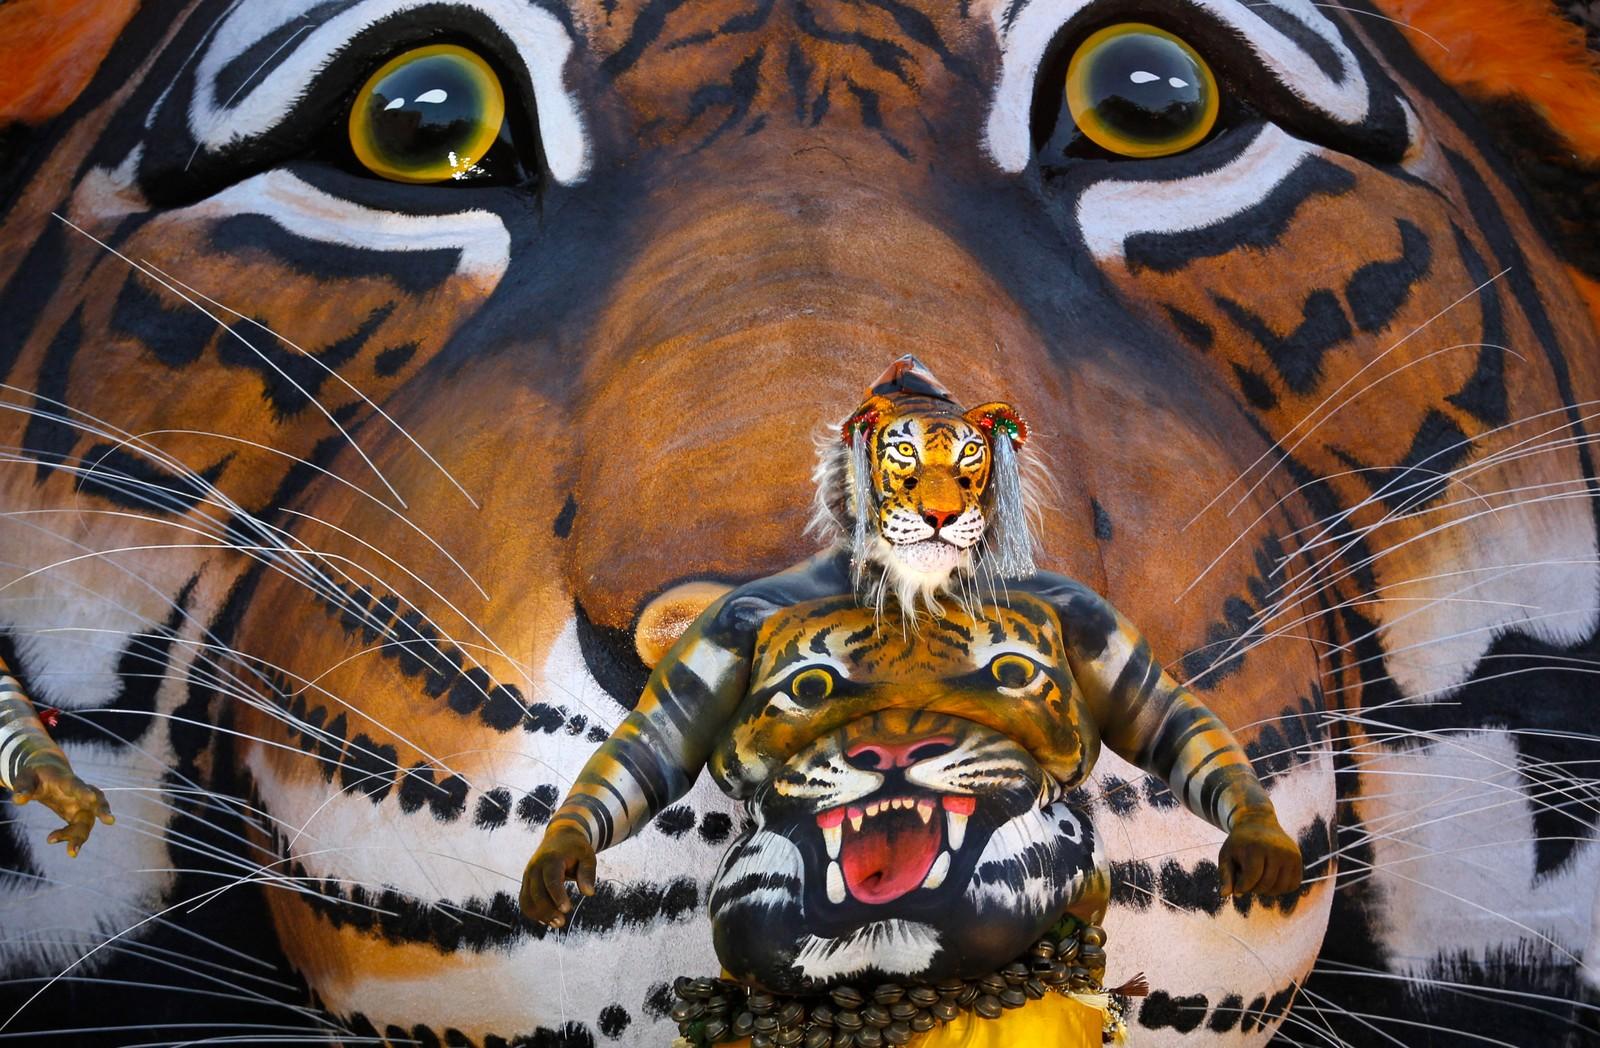 Denne kroppsmalte kunstneren hedret tigeren under Onam-festivalen i Thrissur, India.